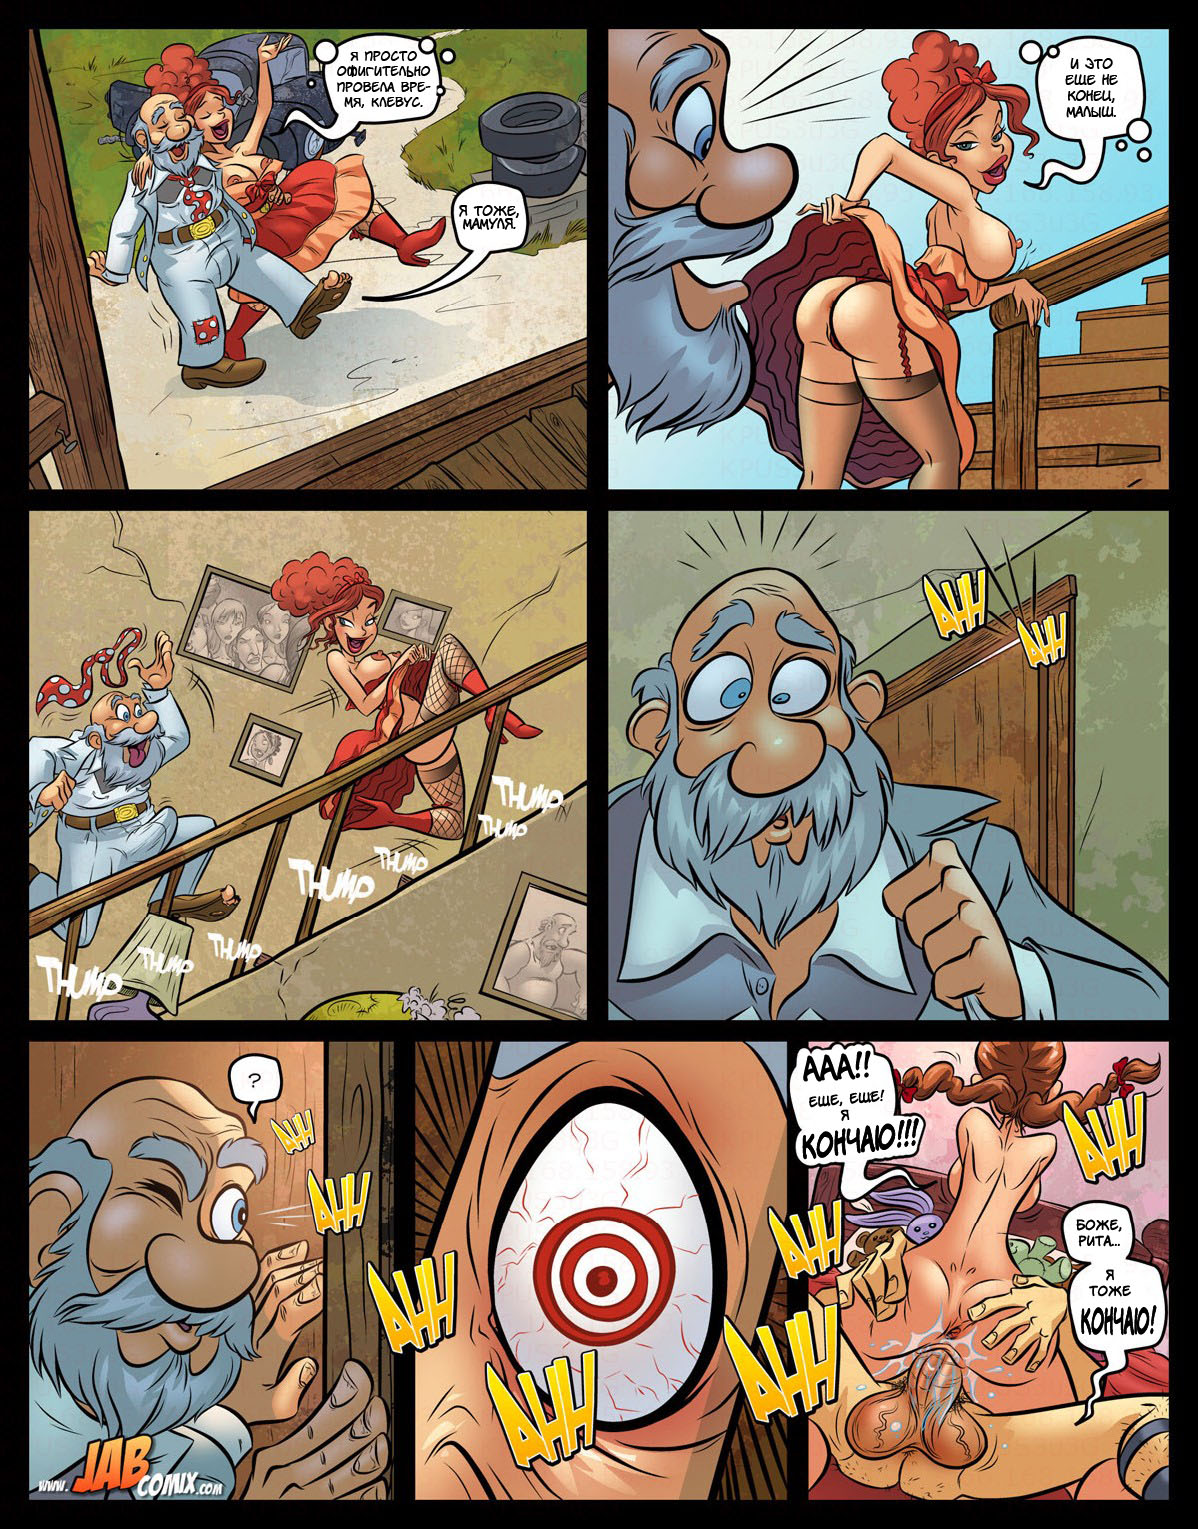 Эро фермер комиксы 7 фотография